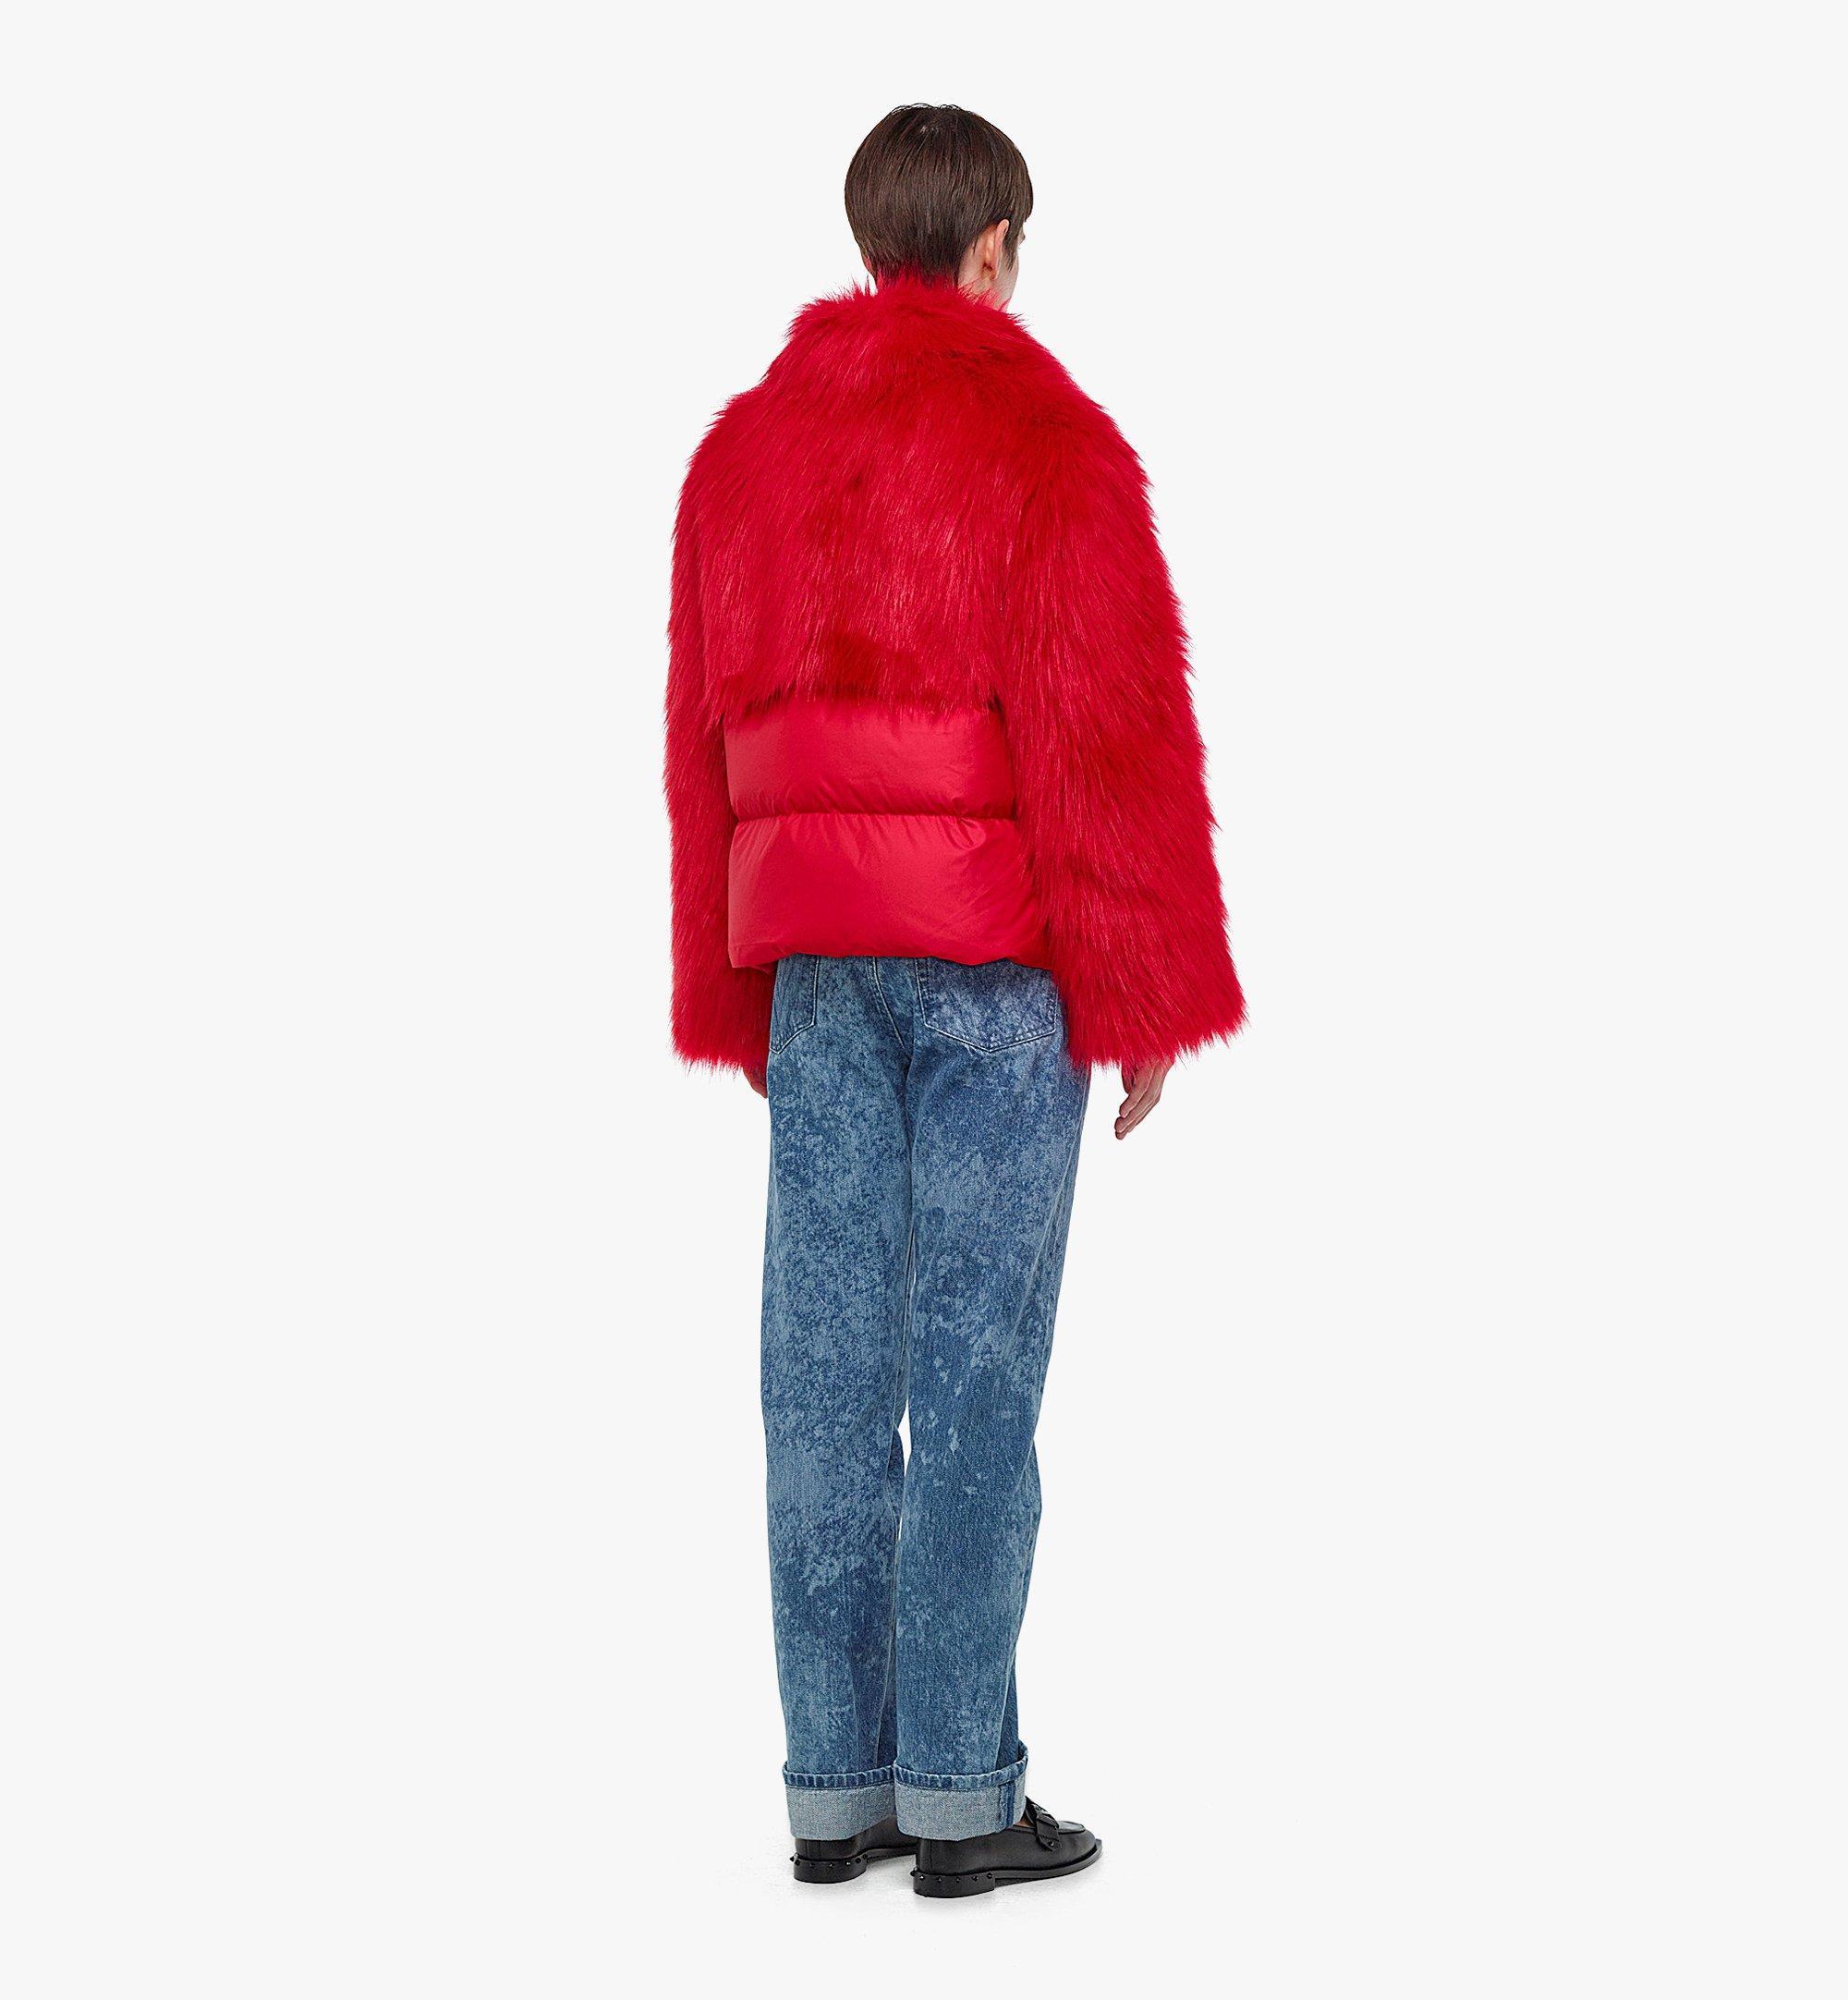 MCM Women's Faux Fur Puffer Jacket Red MFCBAMM02R0040 Alternate View 2